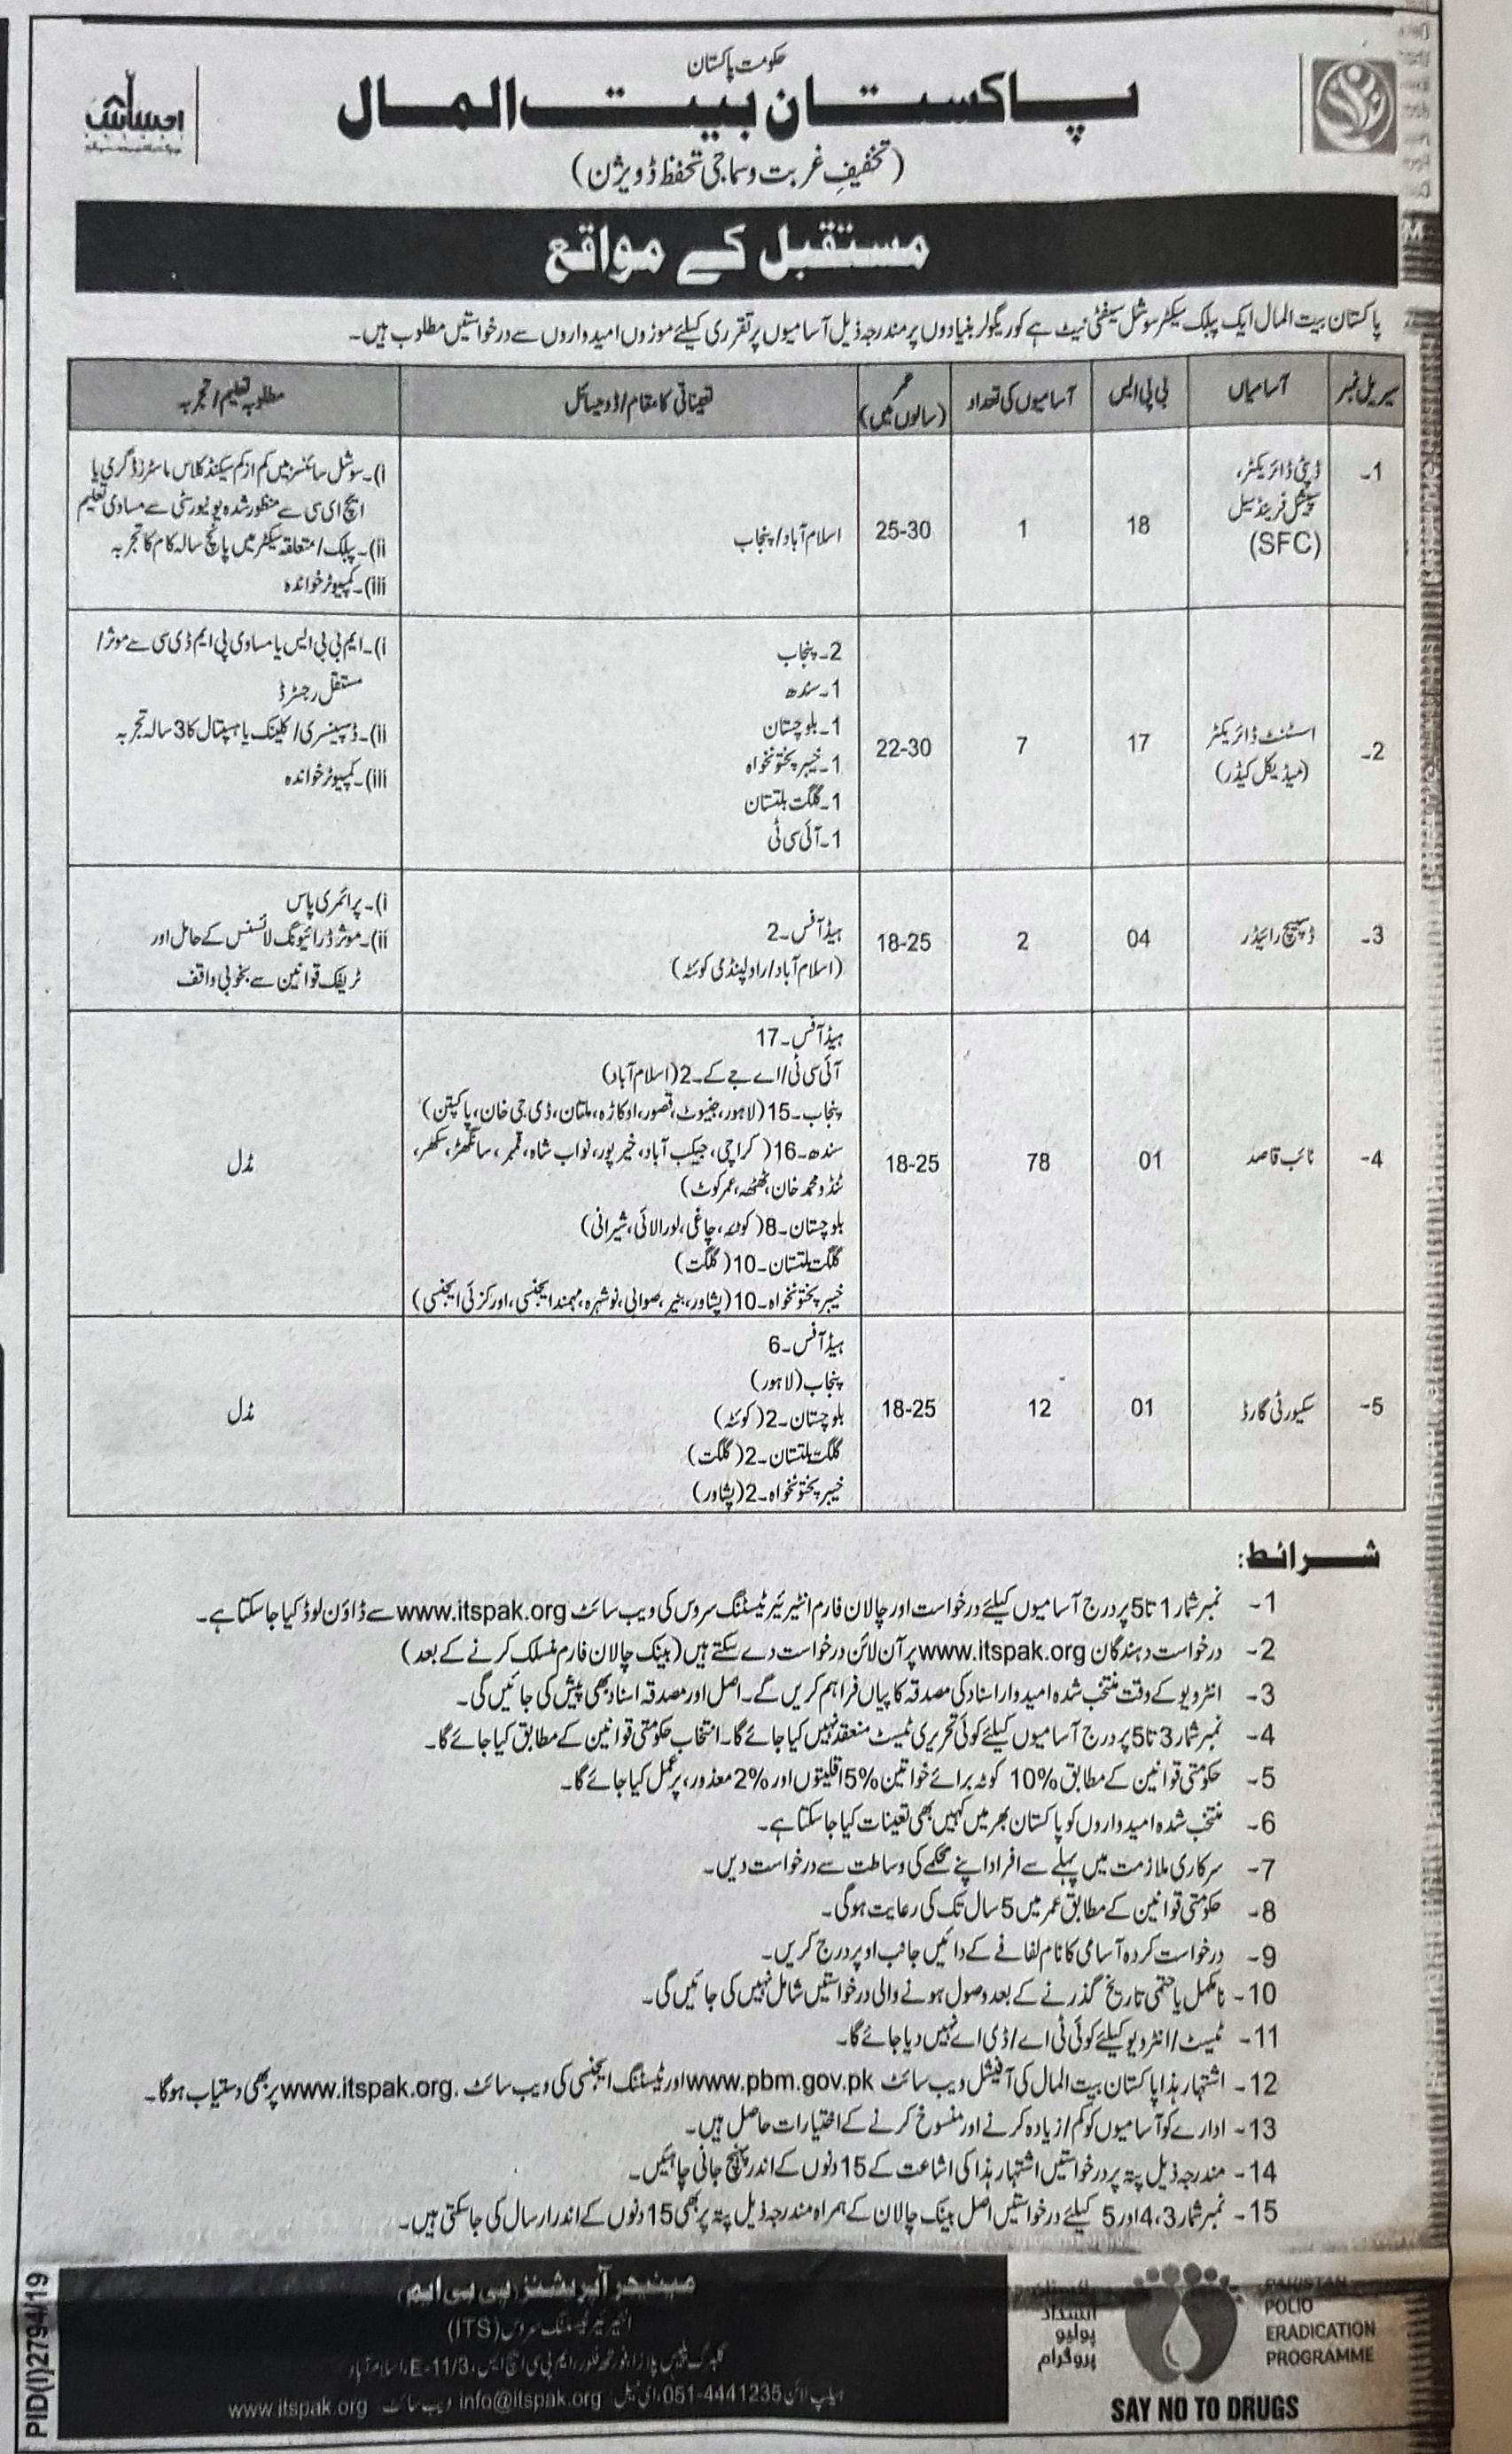 Pakistan Bait ul Mal ITS Jobs 2019 Application Form Roll No Slip download online